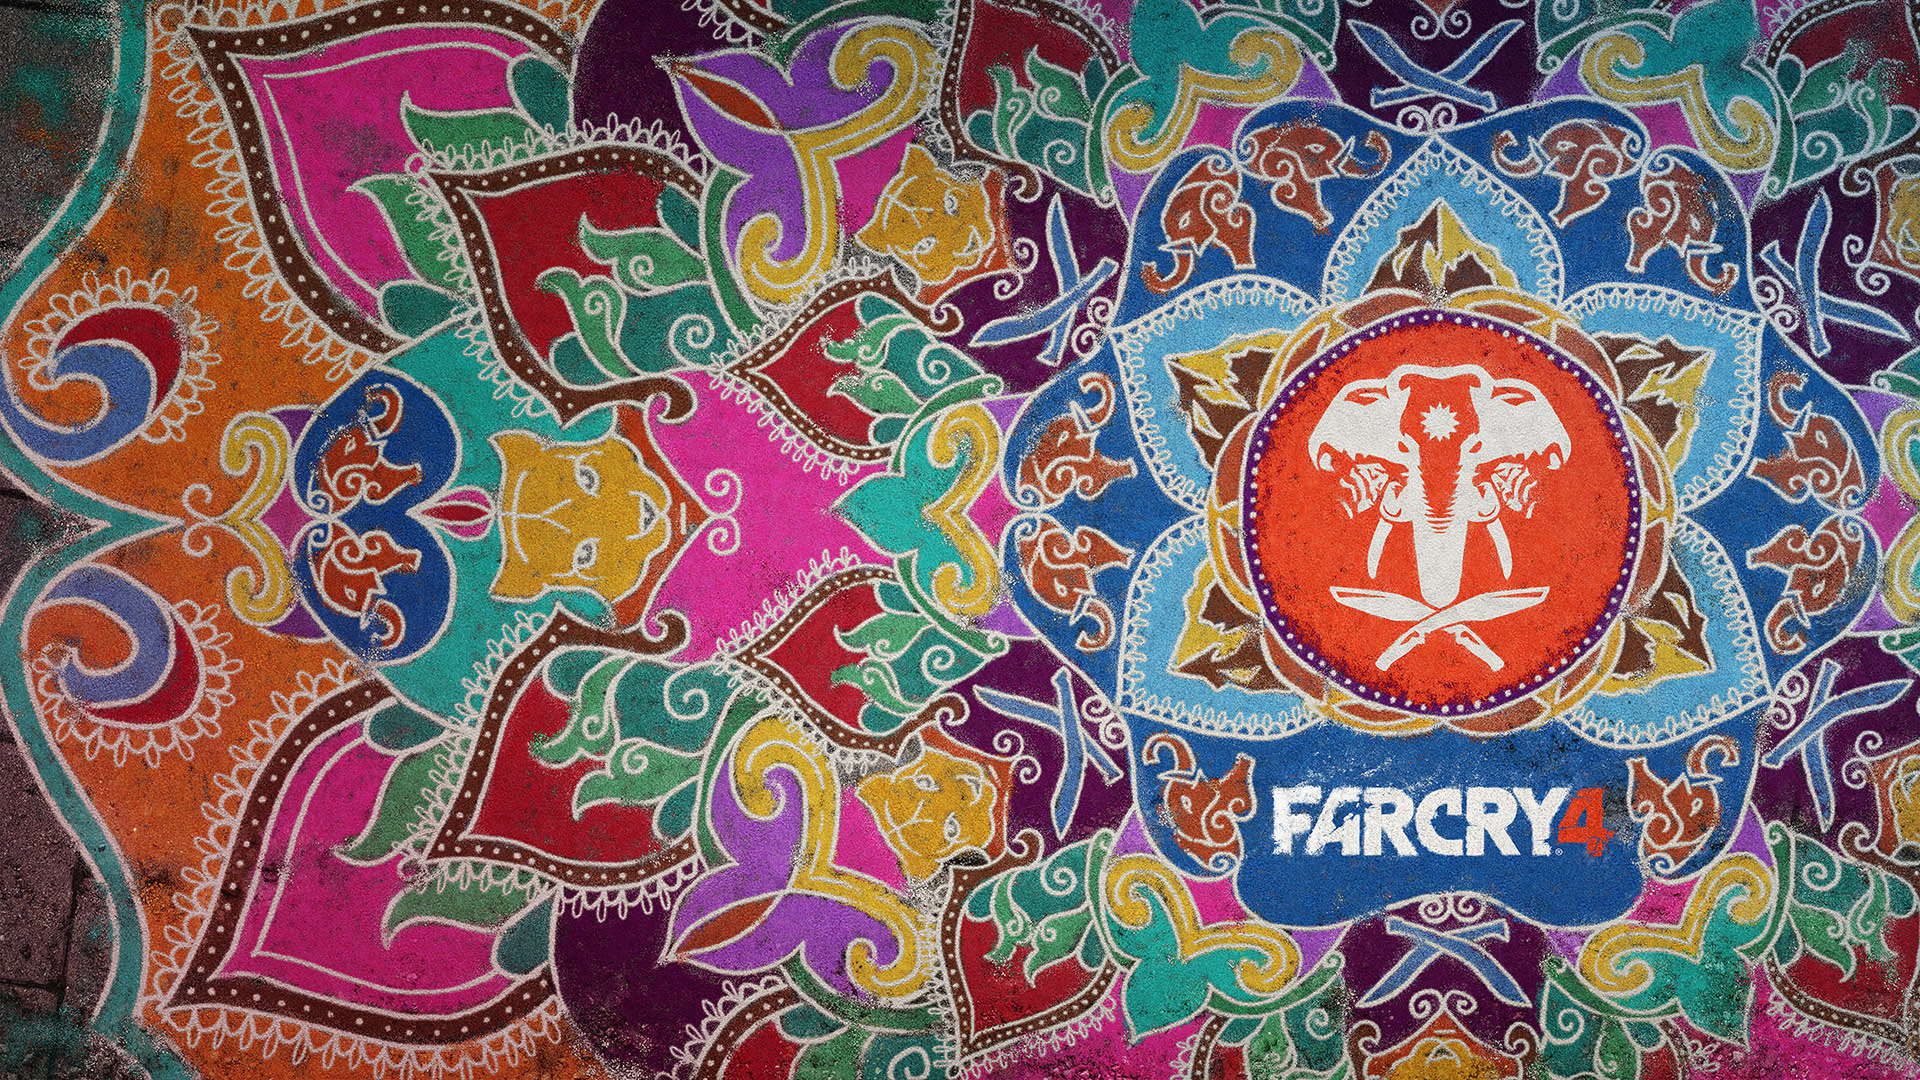 Free Far Cry 4 Wallpaper in 1920x1080